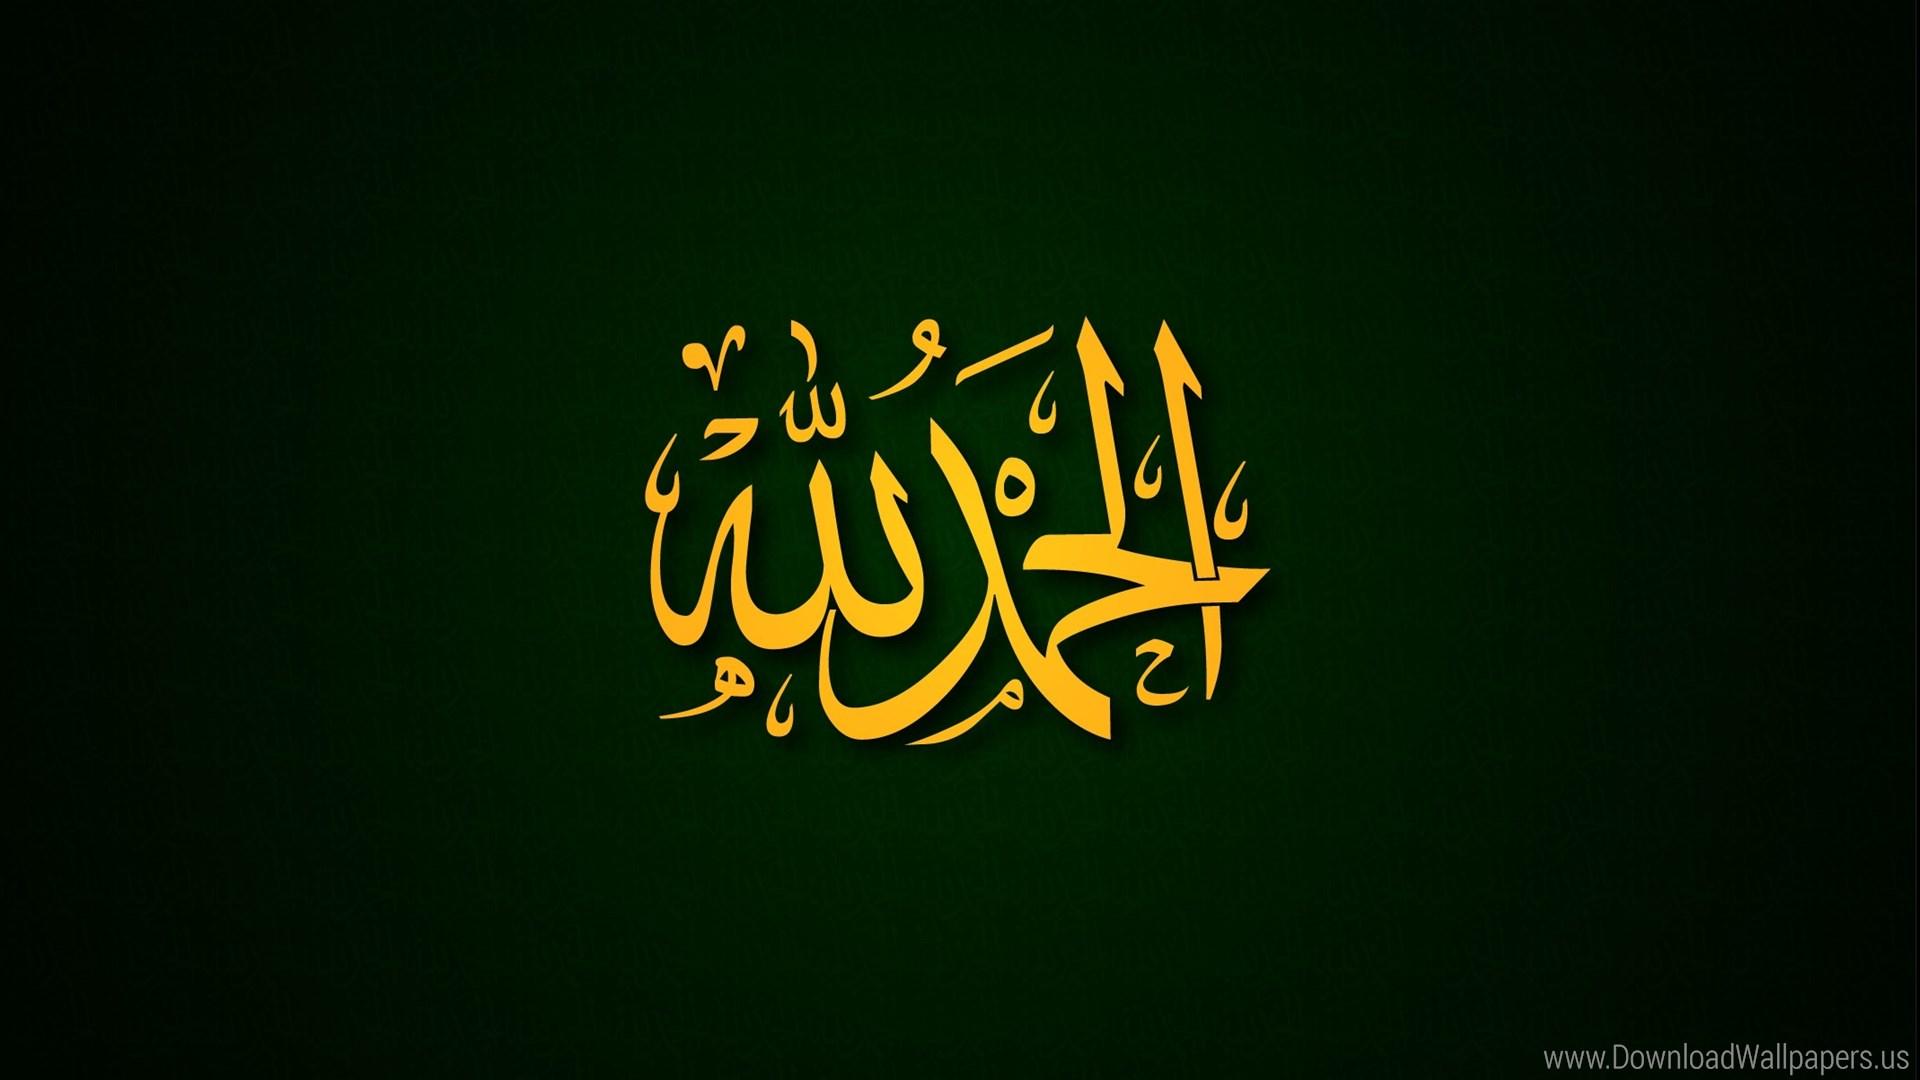 Calligraphy Alhamdulillah , HD Wallpaper & Backgrounds